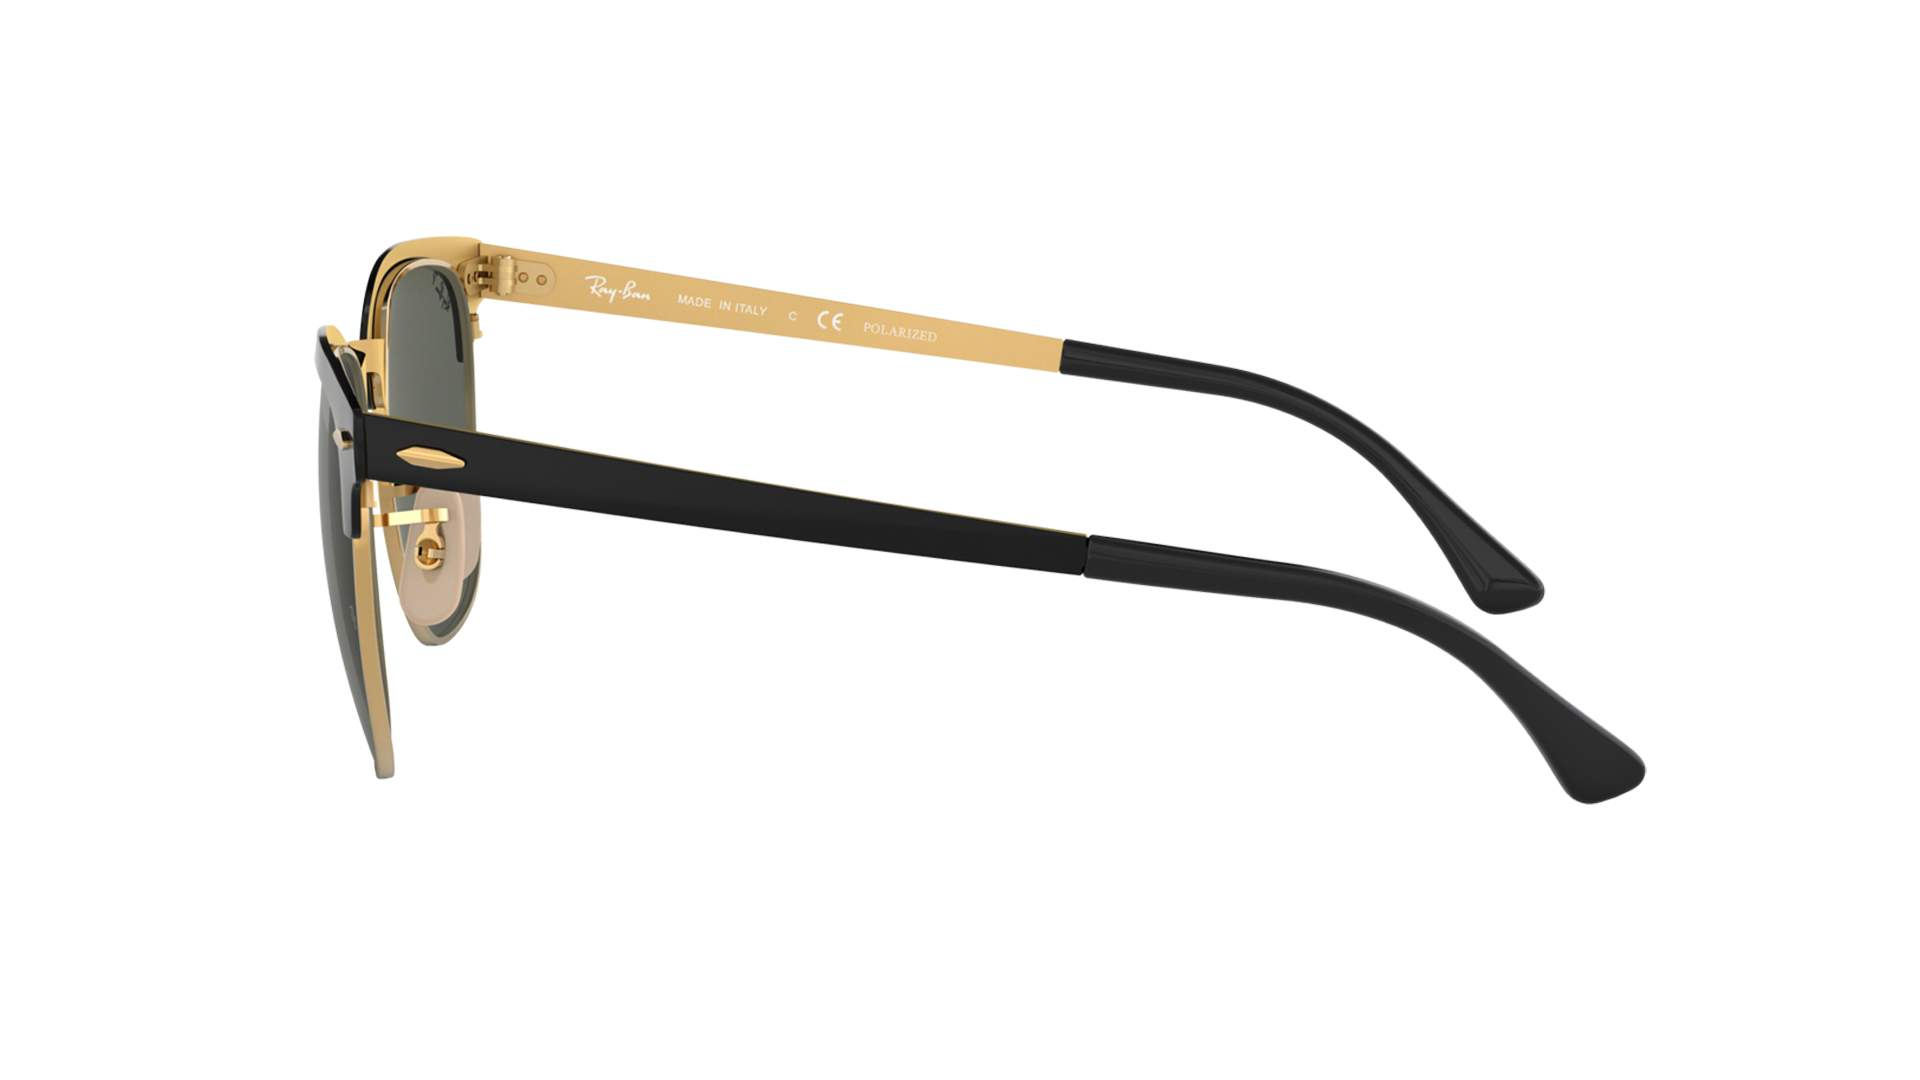 cce93e60961 Sunglasses Ray-Ban Clubmaster Metal Black RB3716 187 58 51-21 Medium  Polarized